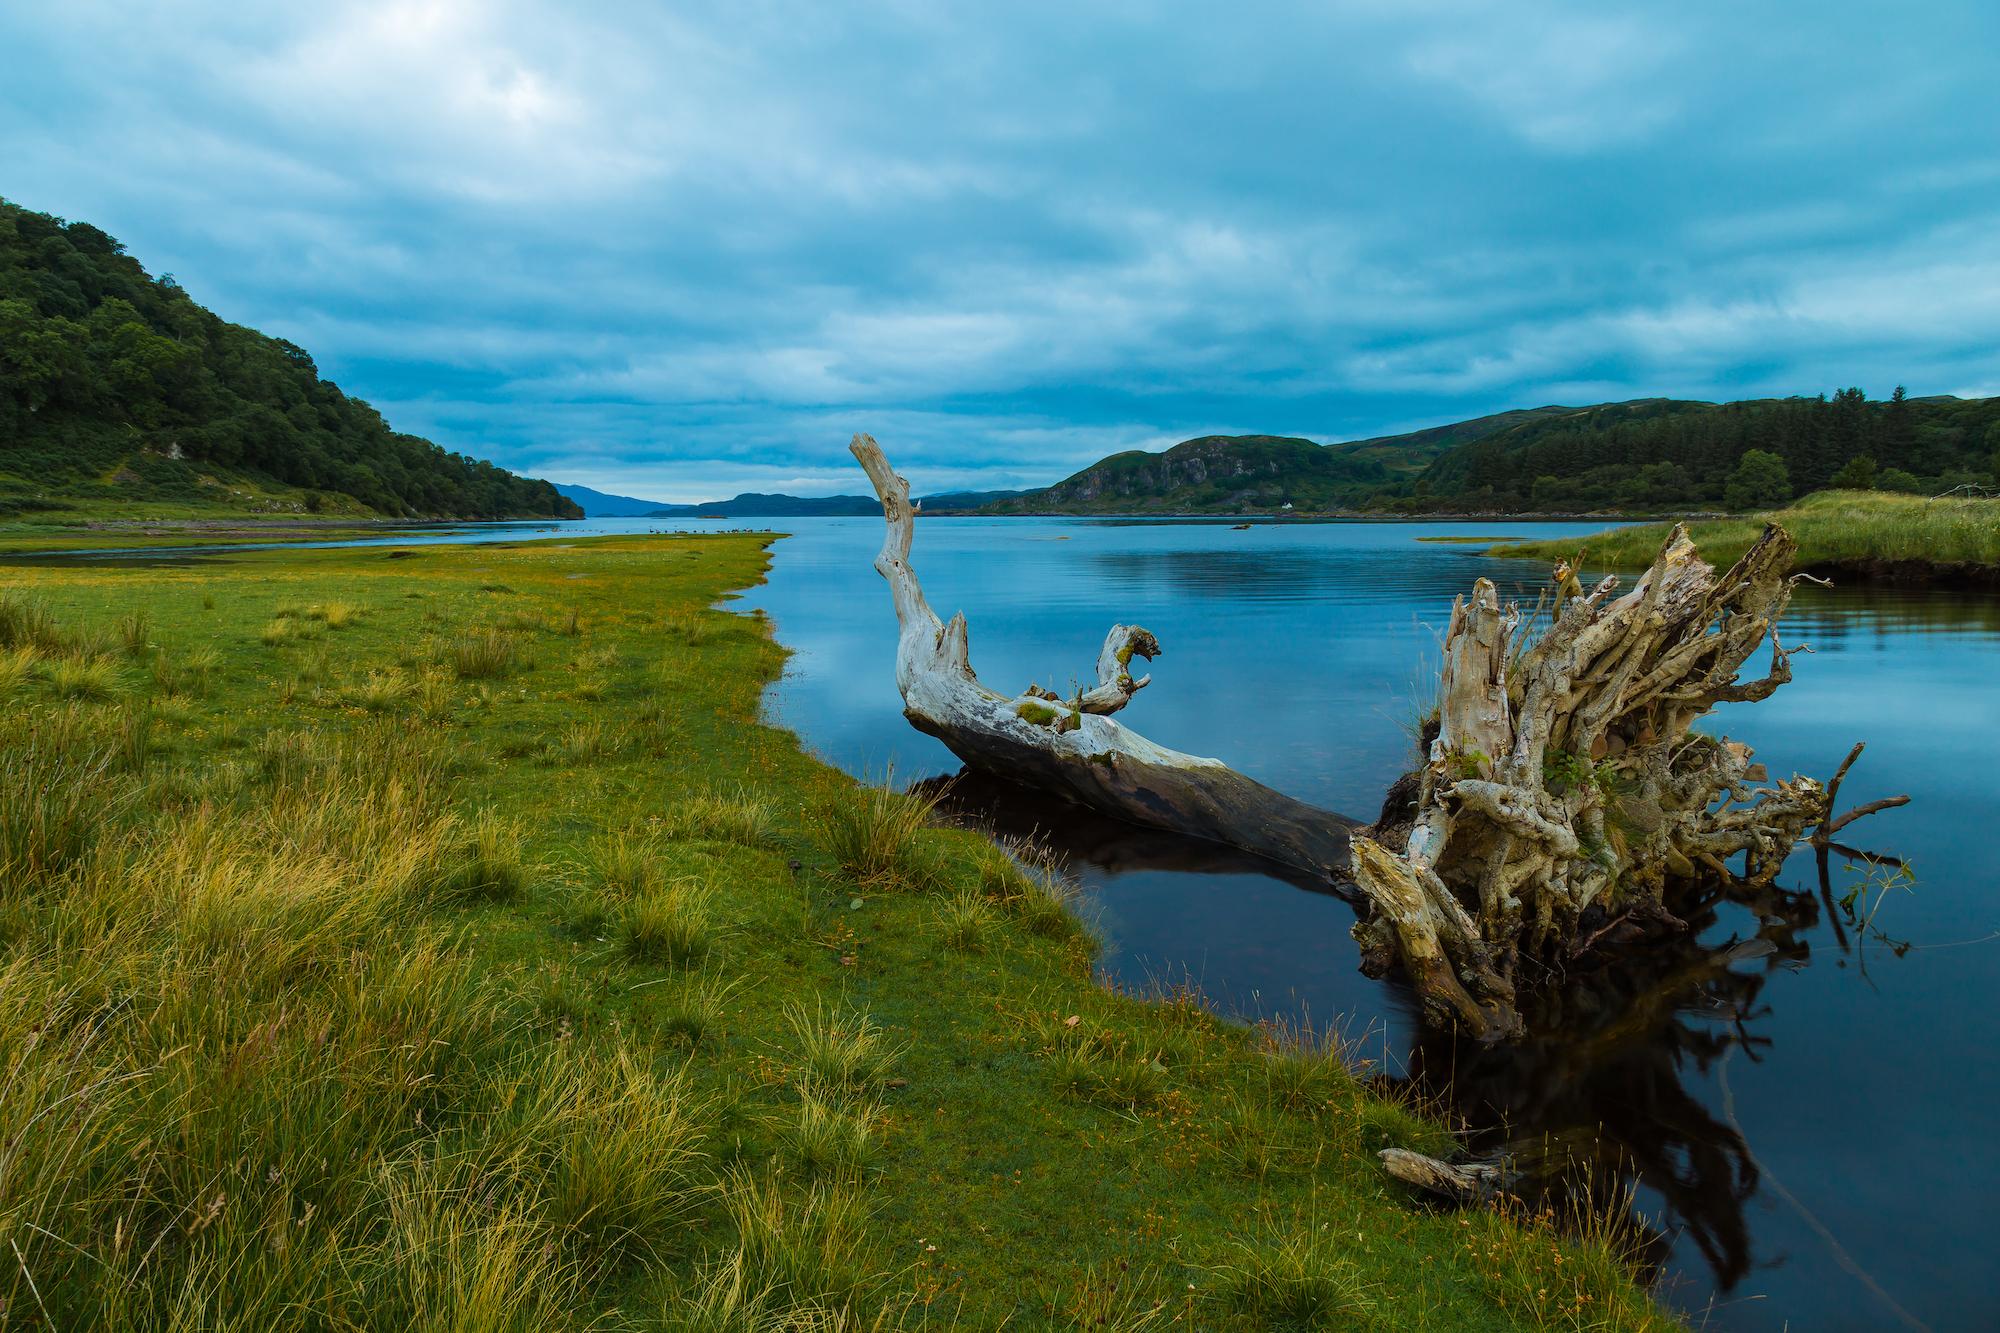 (211) Driftwood, Loch Feochan, Kilninver, Oban, Argyll & Bute, Scotland.jpg